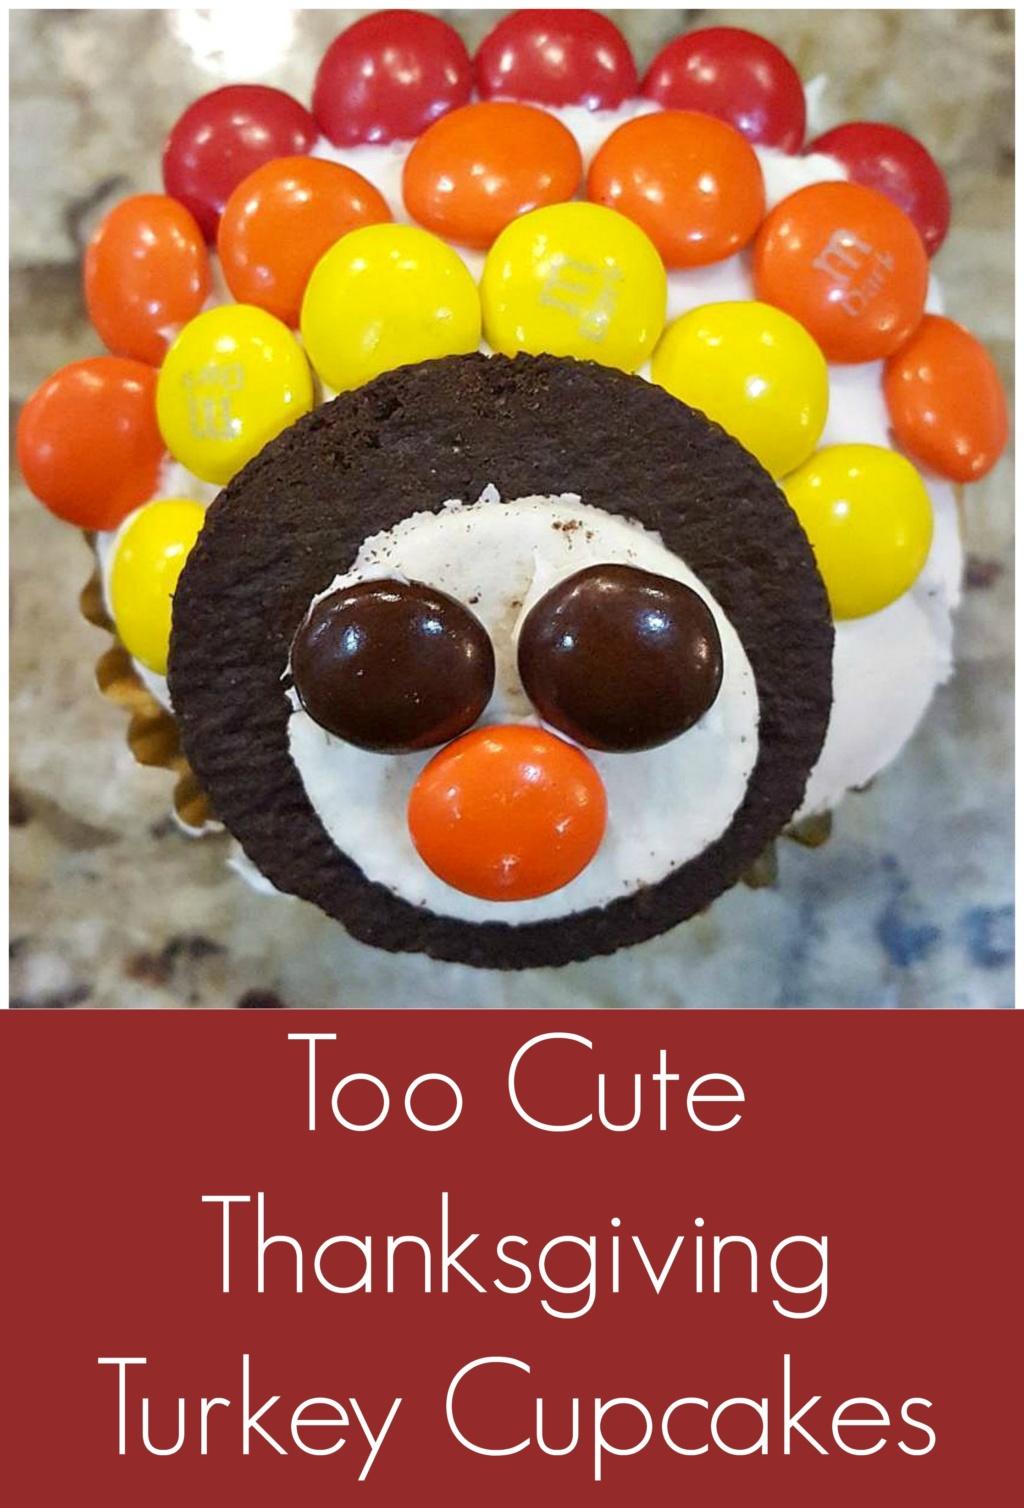 Thanksgiving Turkey Cupcakes – A Super Easy DIY